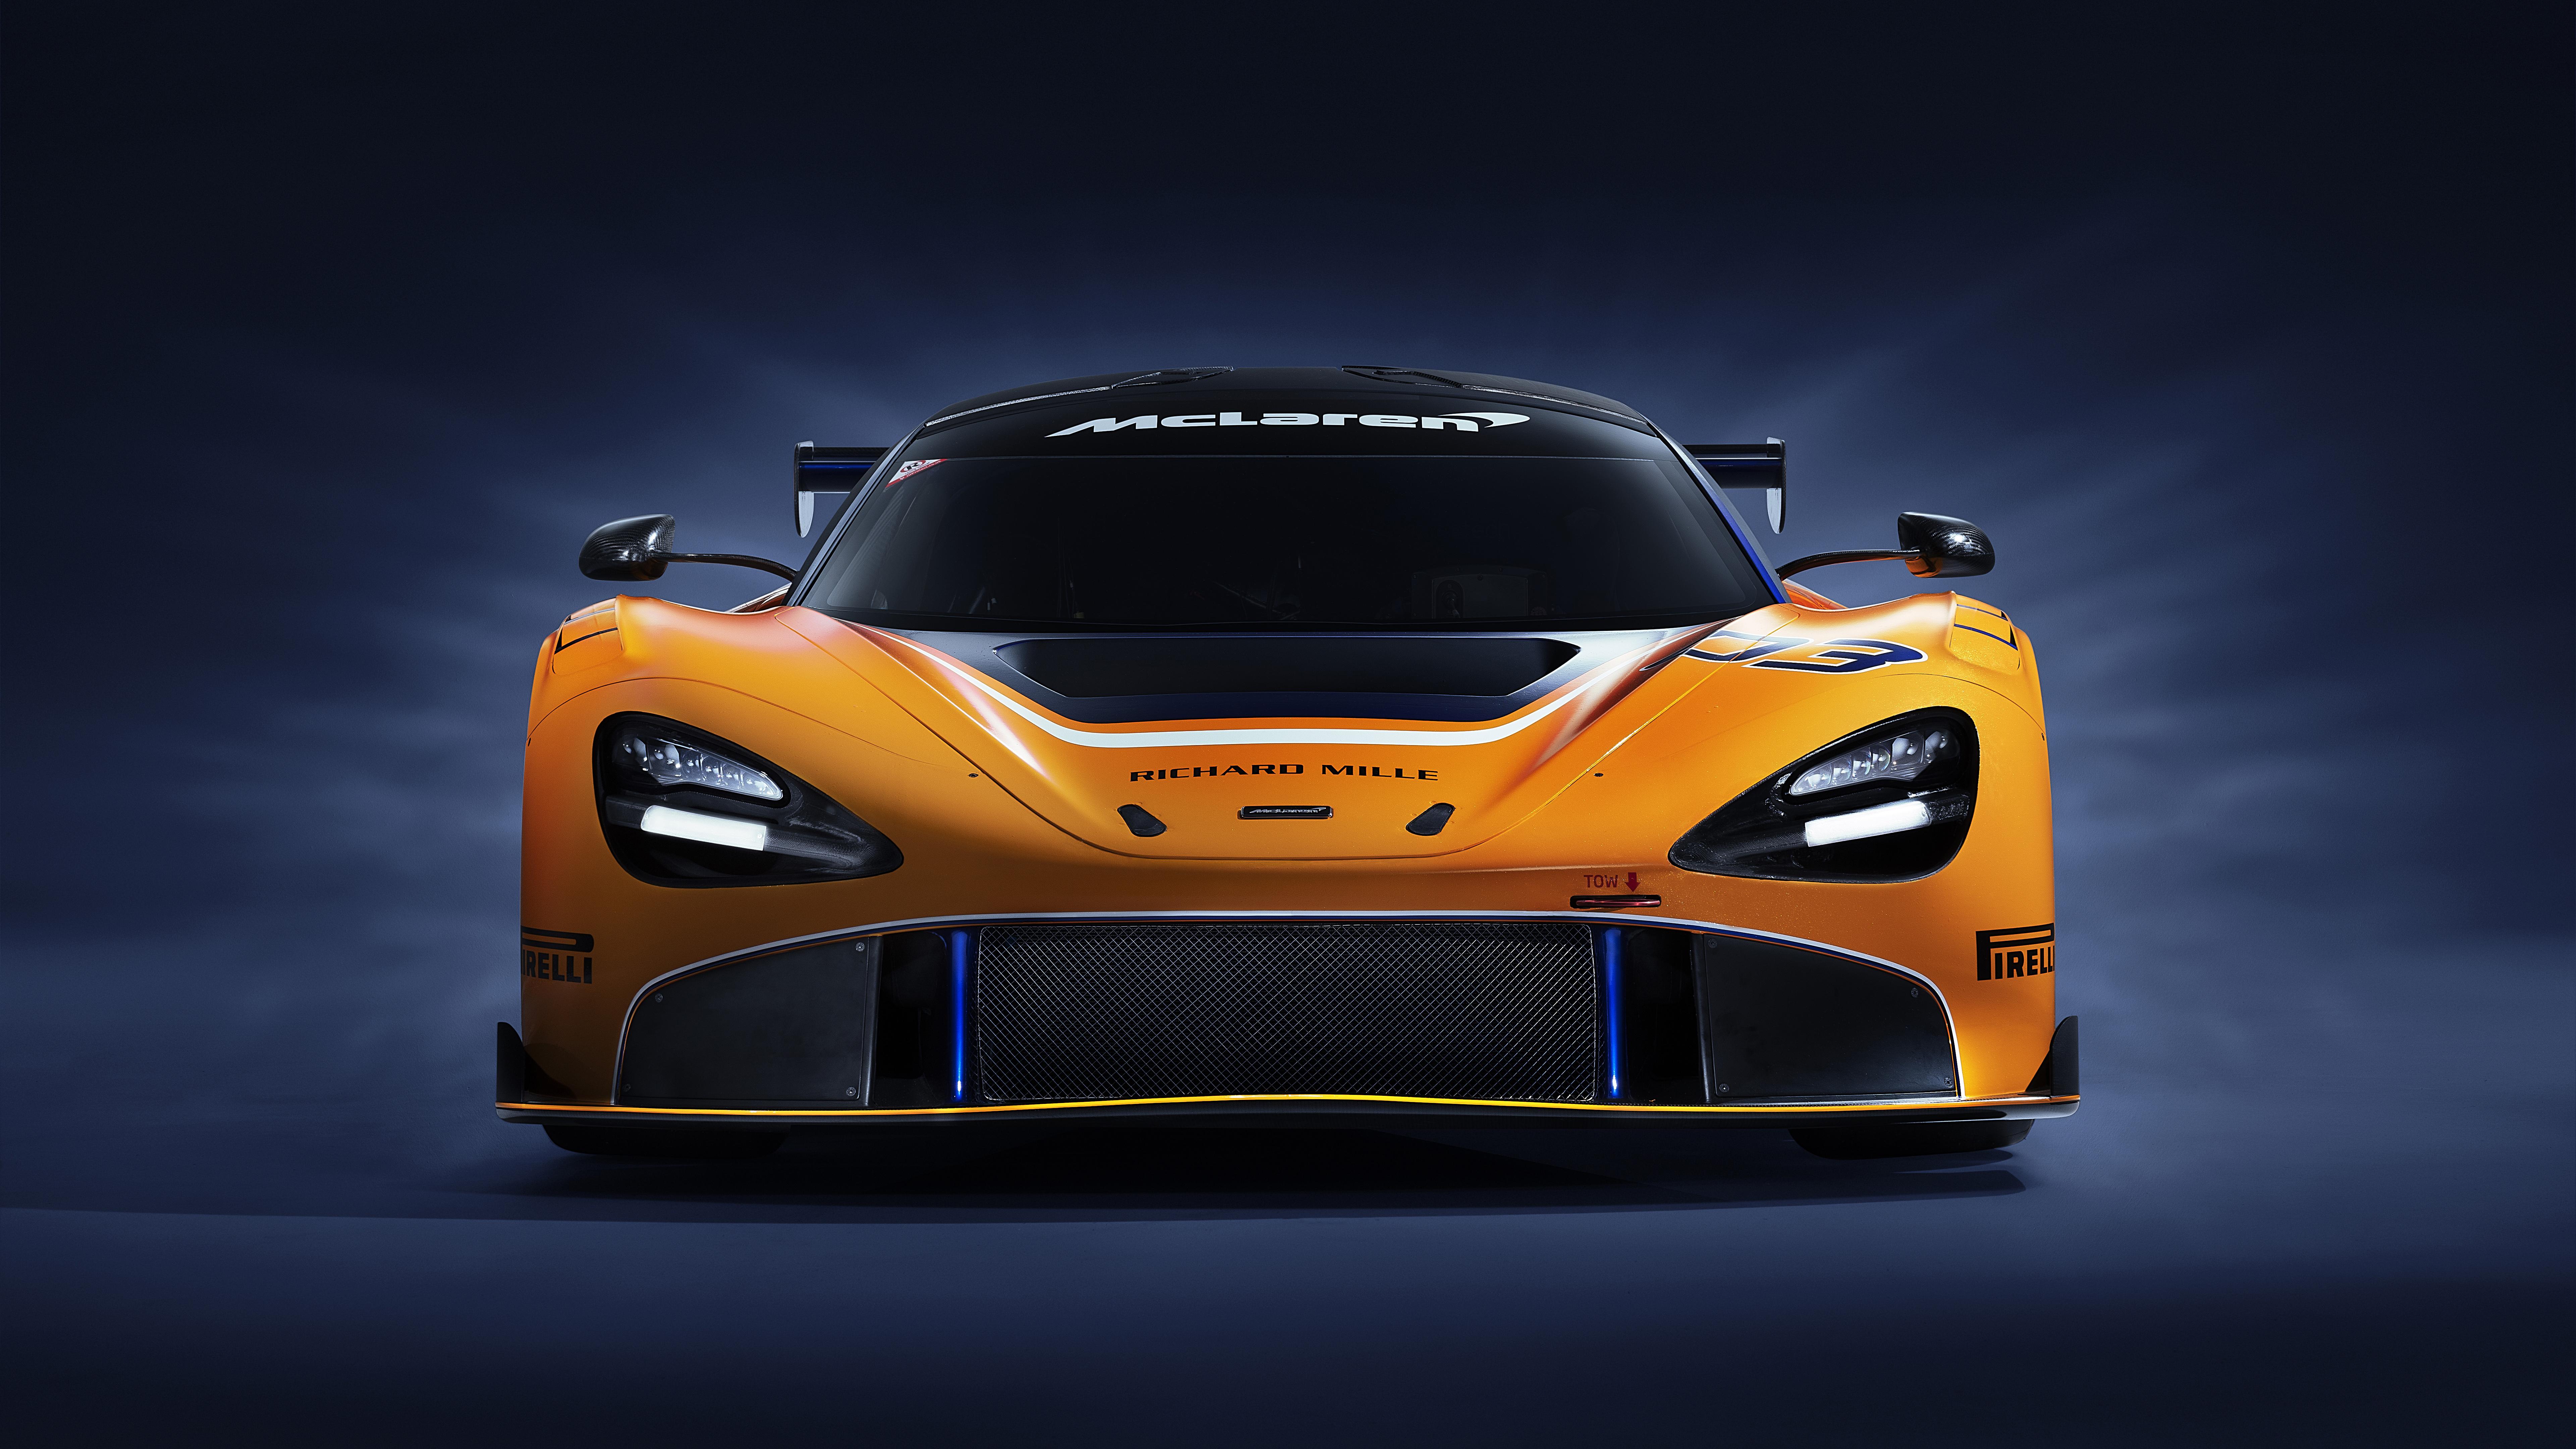 2019 McLaren 720S GT3 4K 8K 3 Wallpaper | HD Car ...